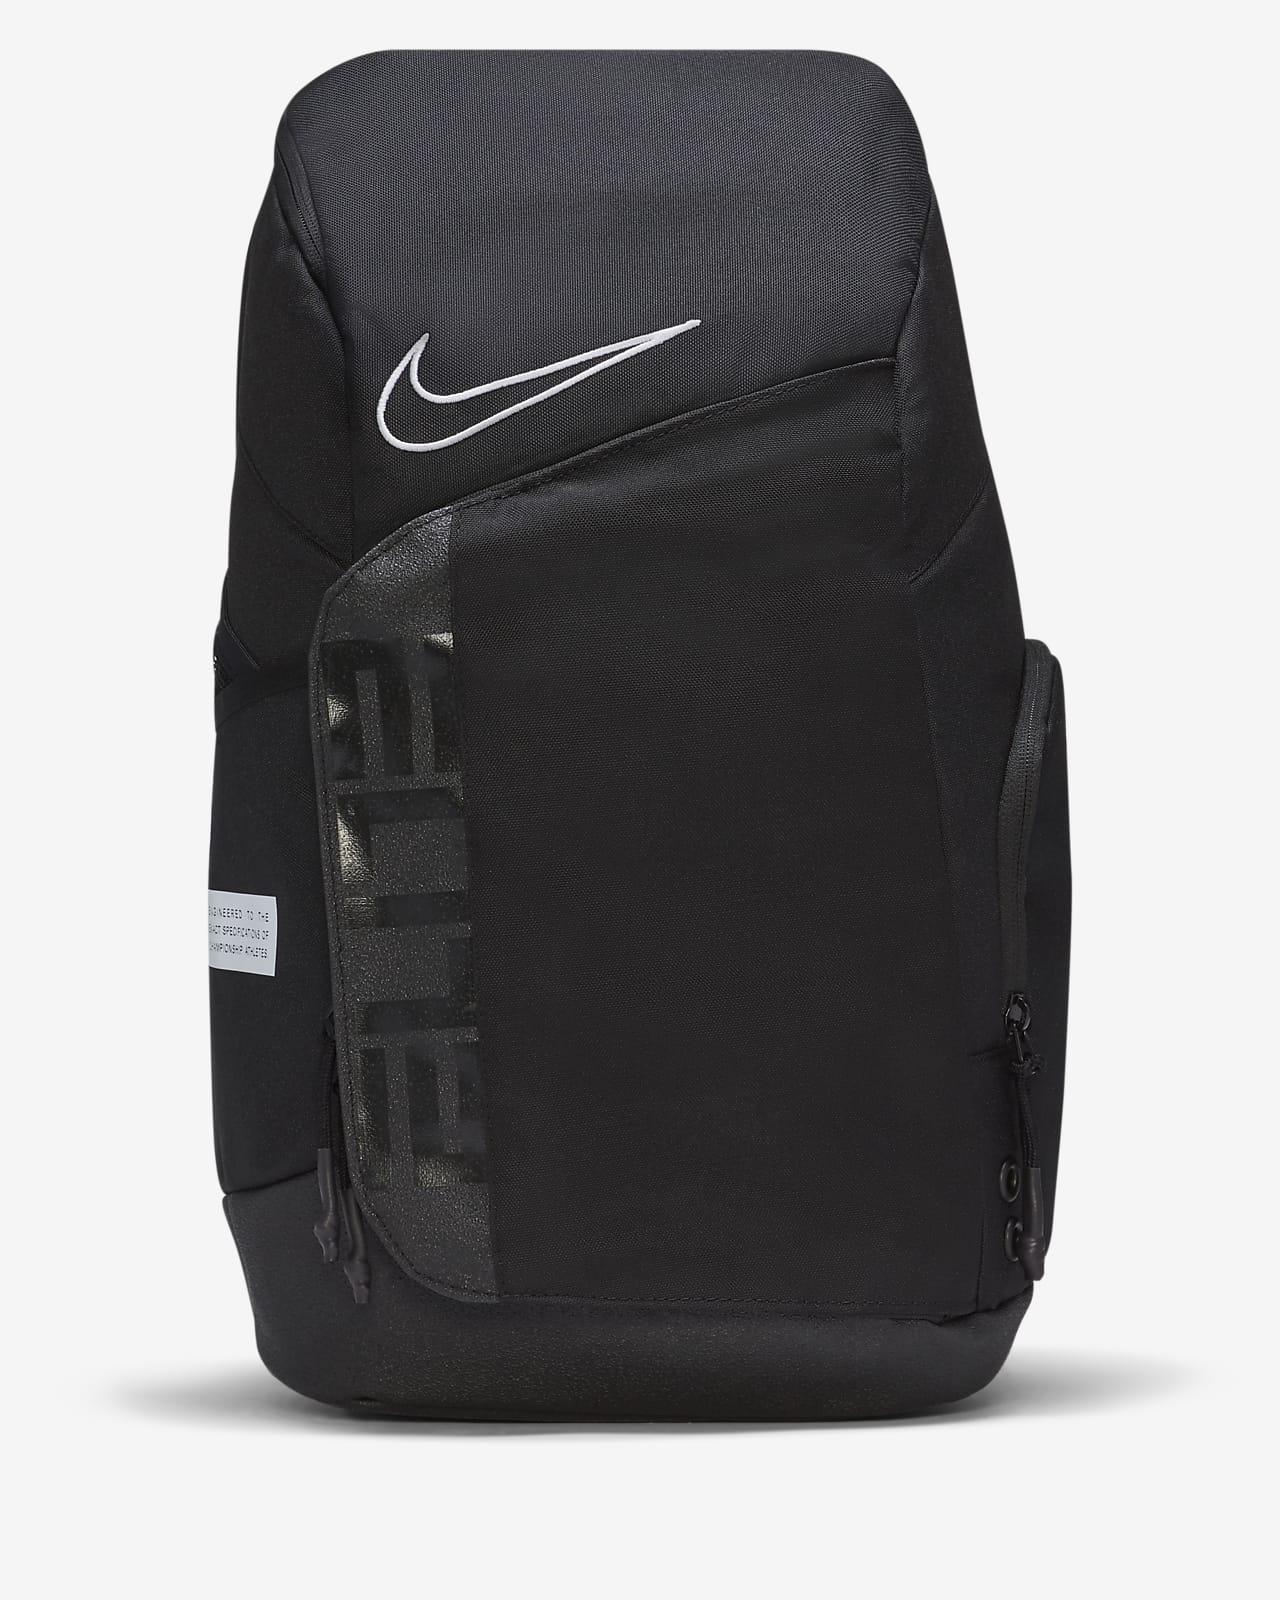 Nike Elite Pro Small Basketball Backpack